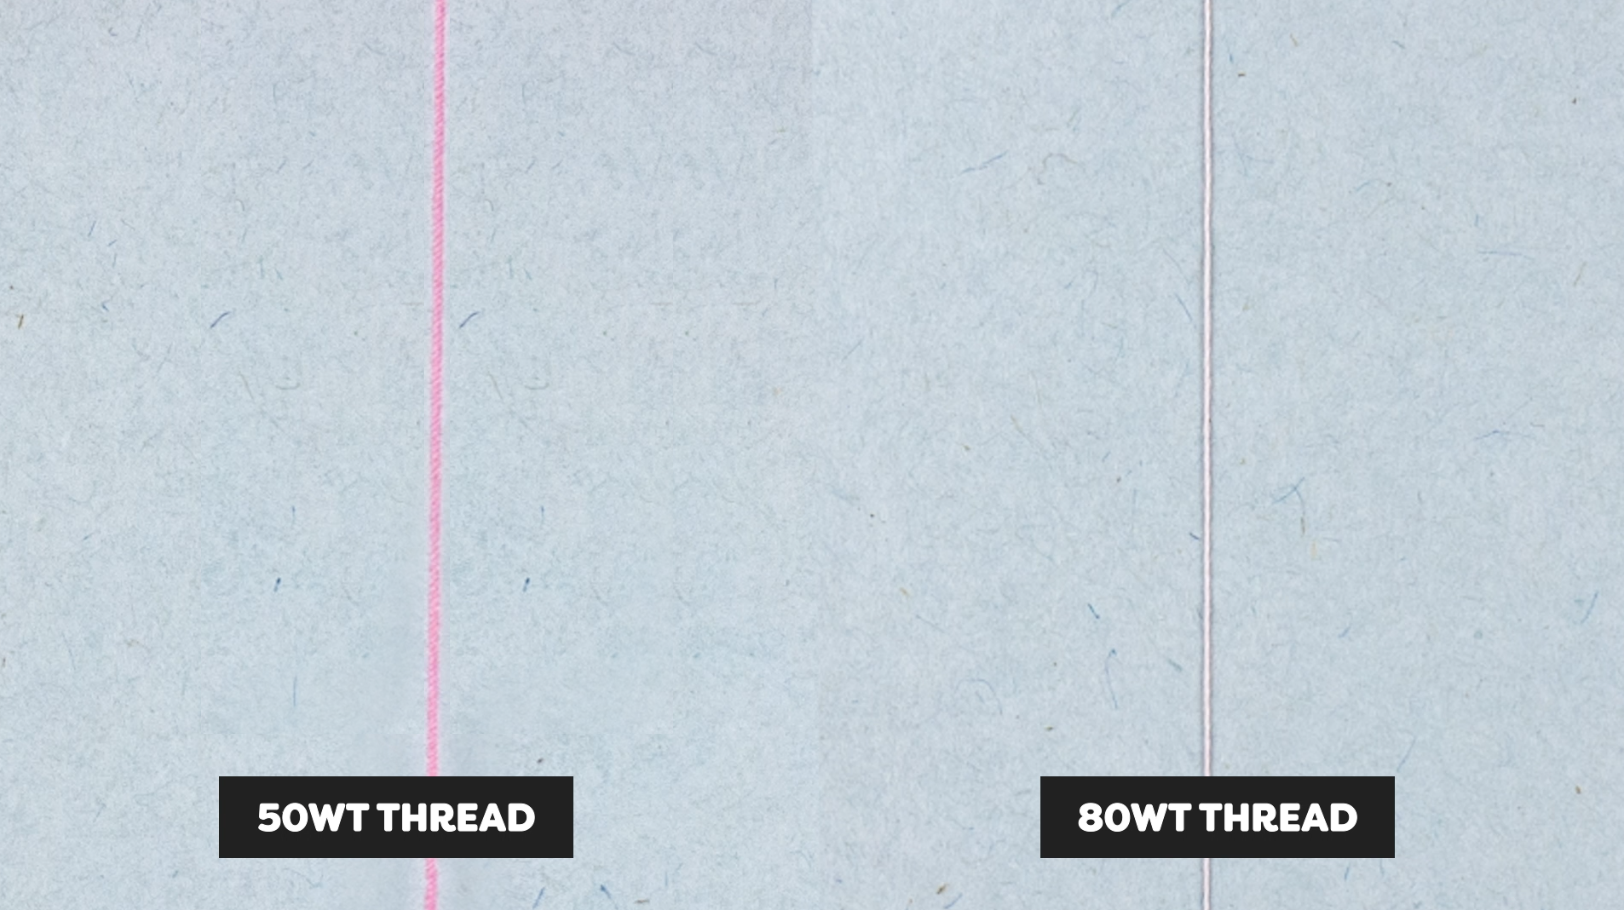 thread-myth-image-4.png